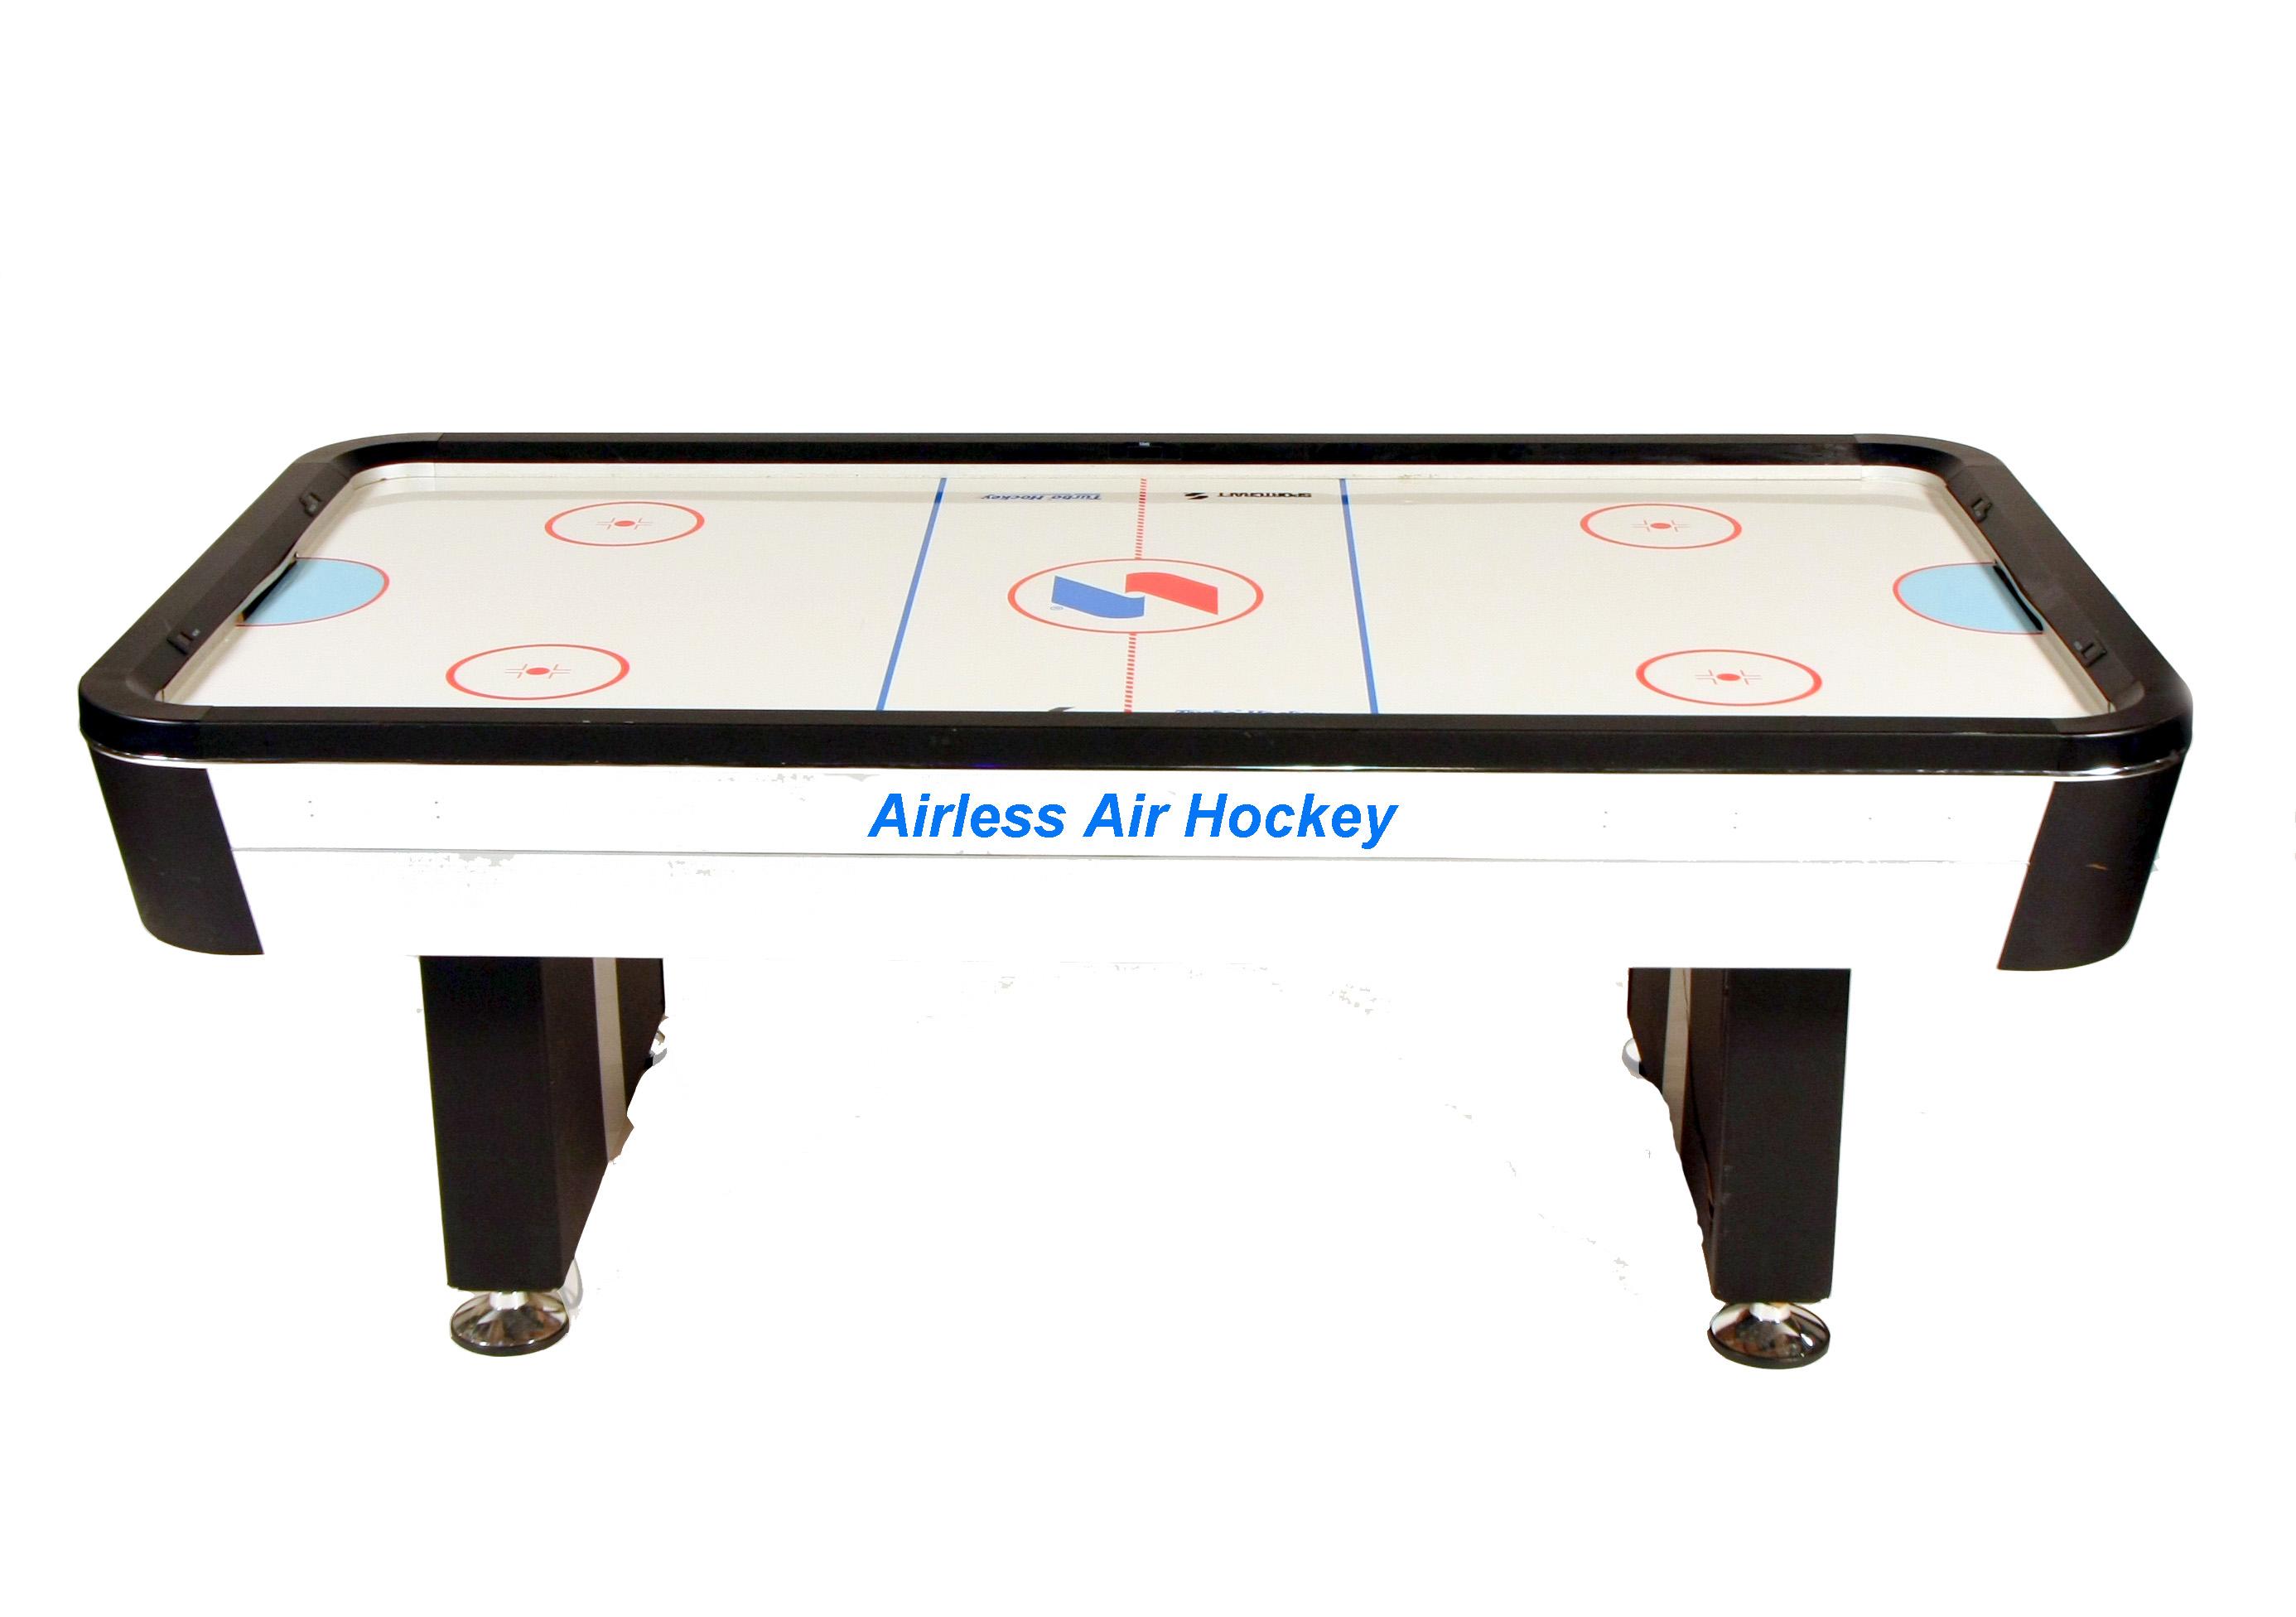 Airless Air Hockey